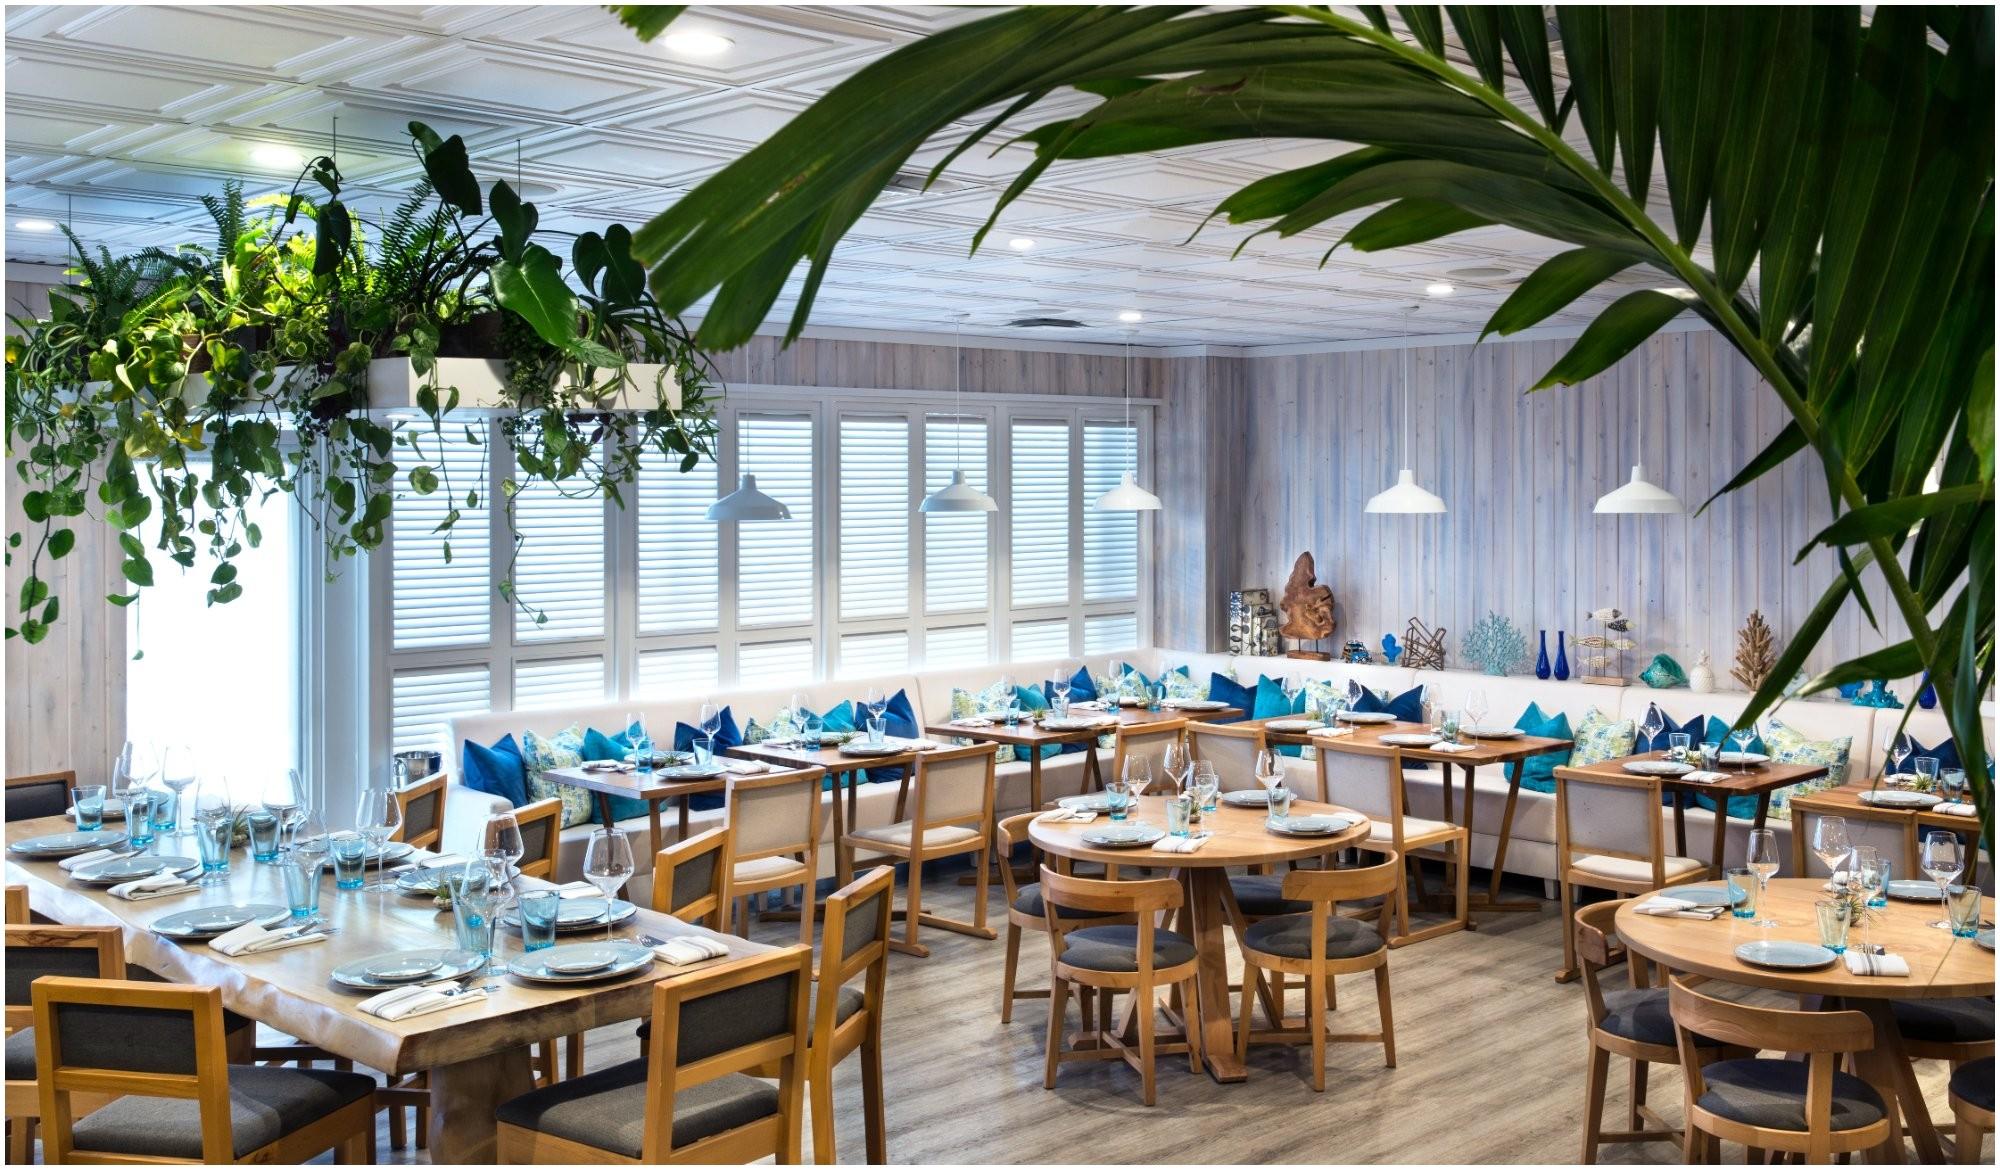 Top Rated Italian Restaurants In south Beach Miami Inspirational the 10 Best Restaurants Near Hilton Bentley Miami south Beach